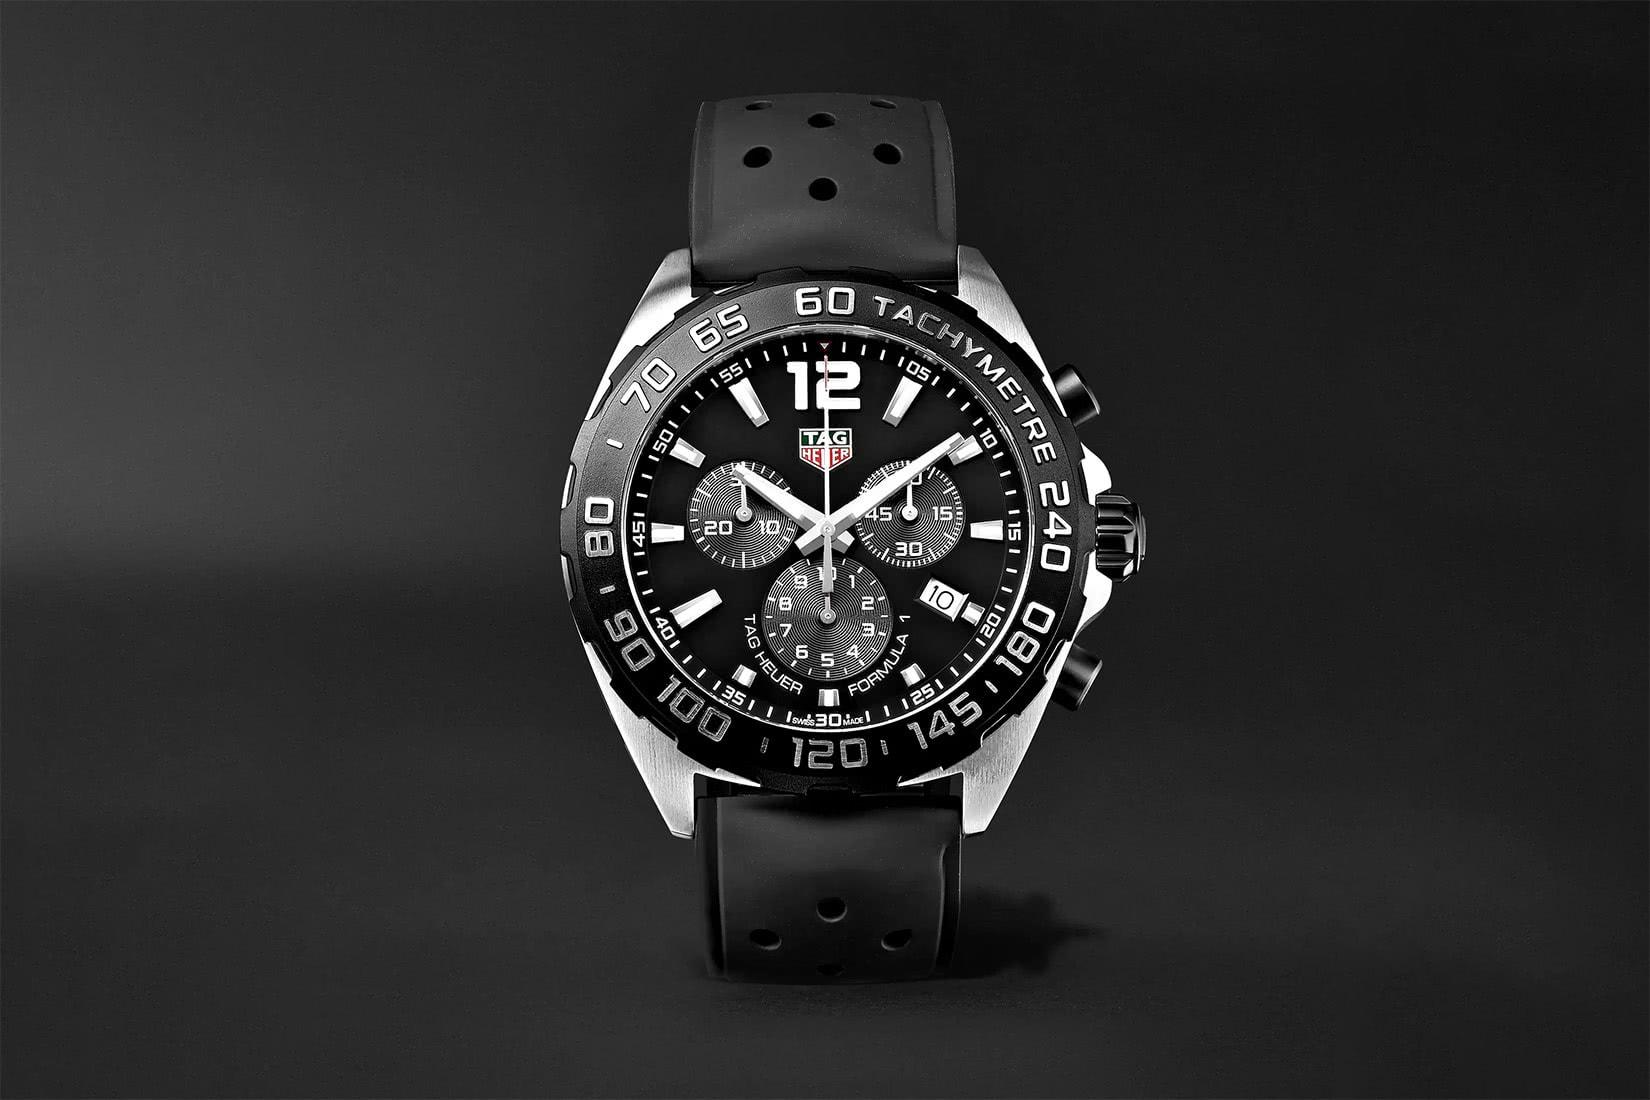 watch styles racing - Luxe Digital